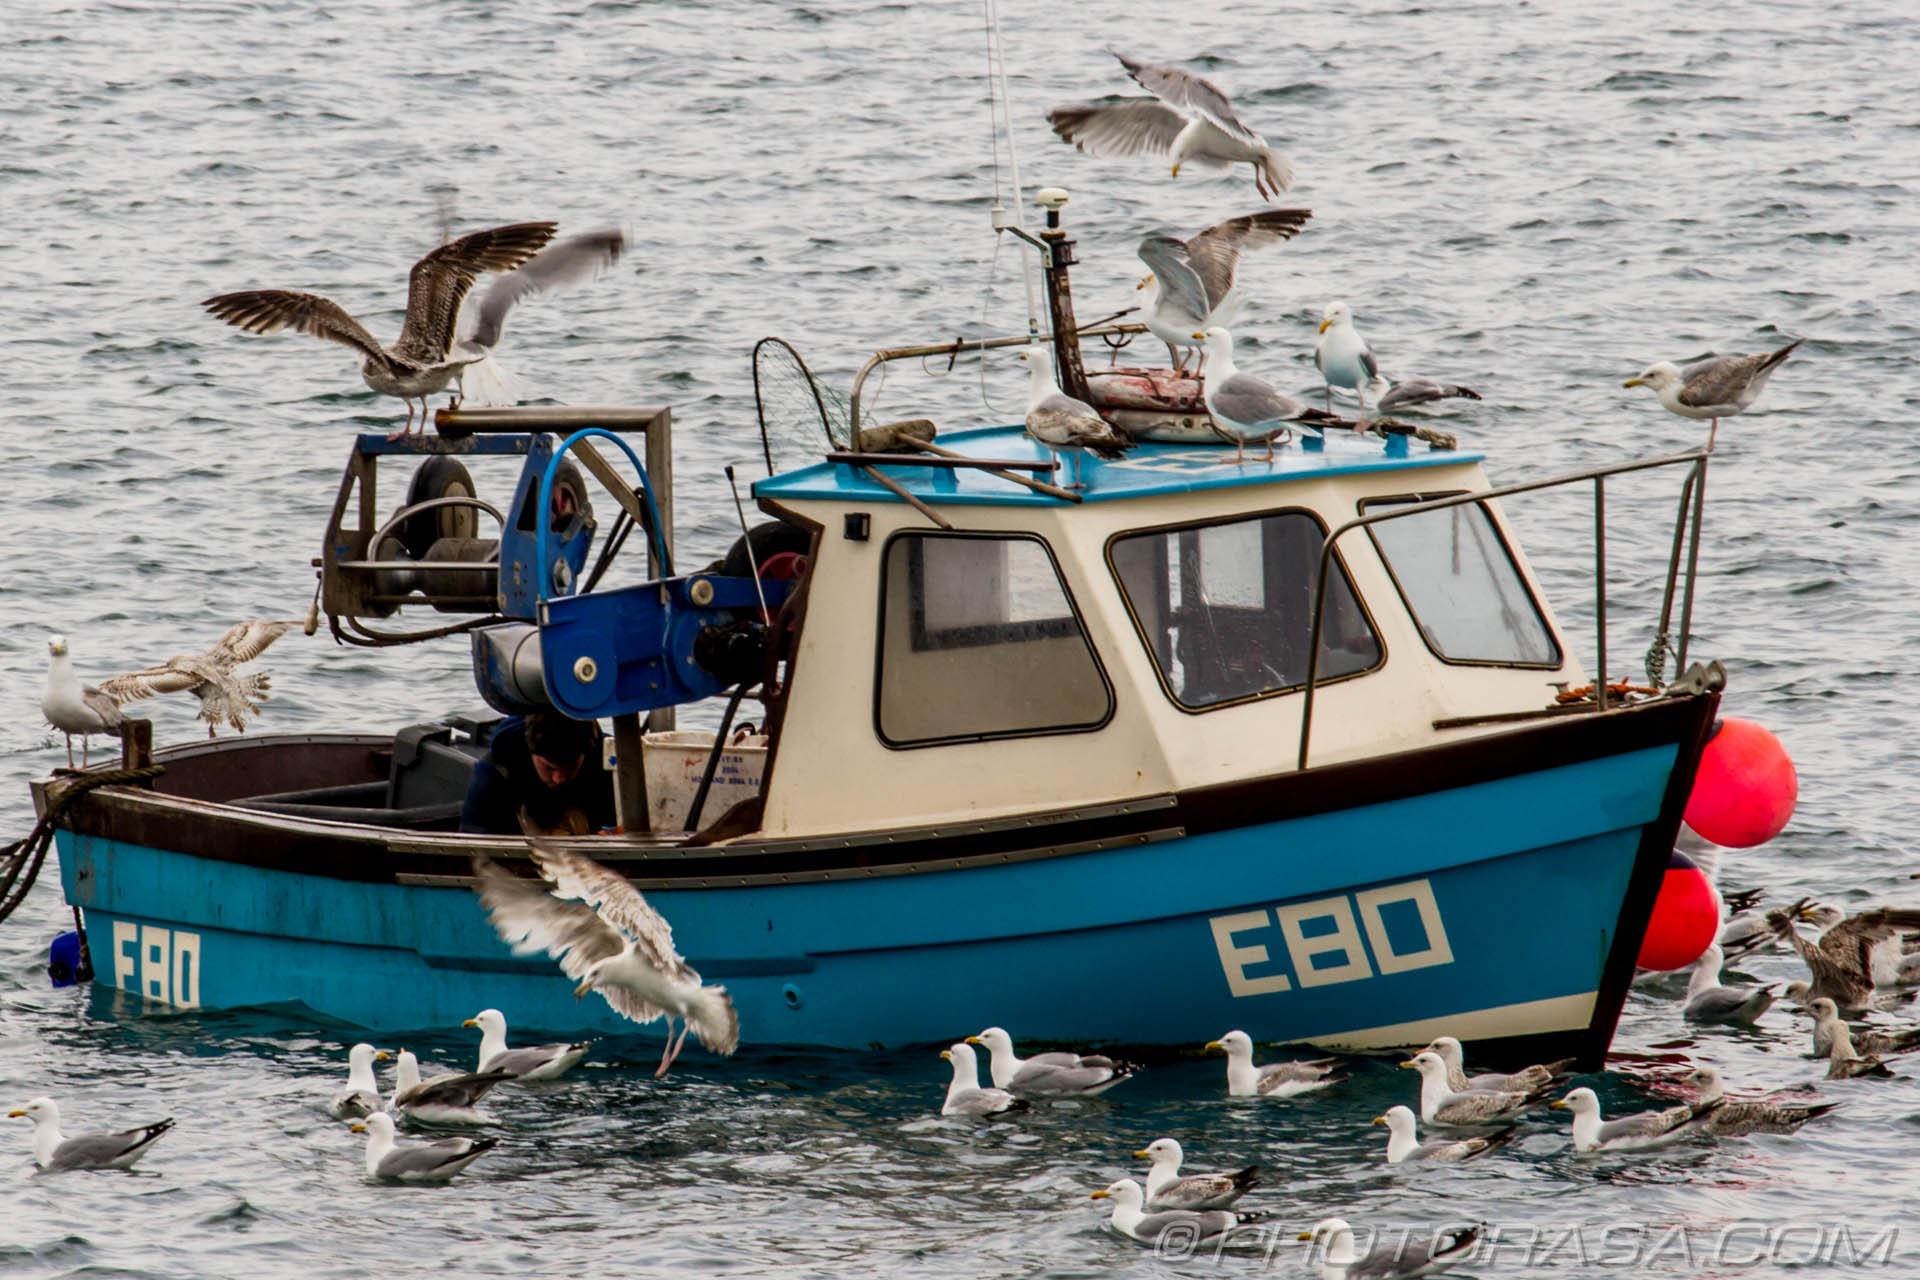 seagulls swarming over returned fishing boat